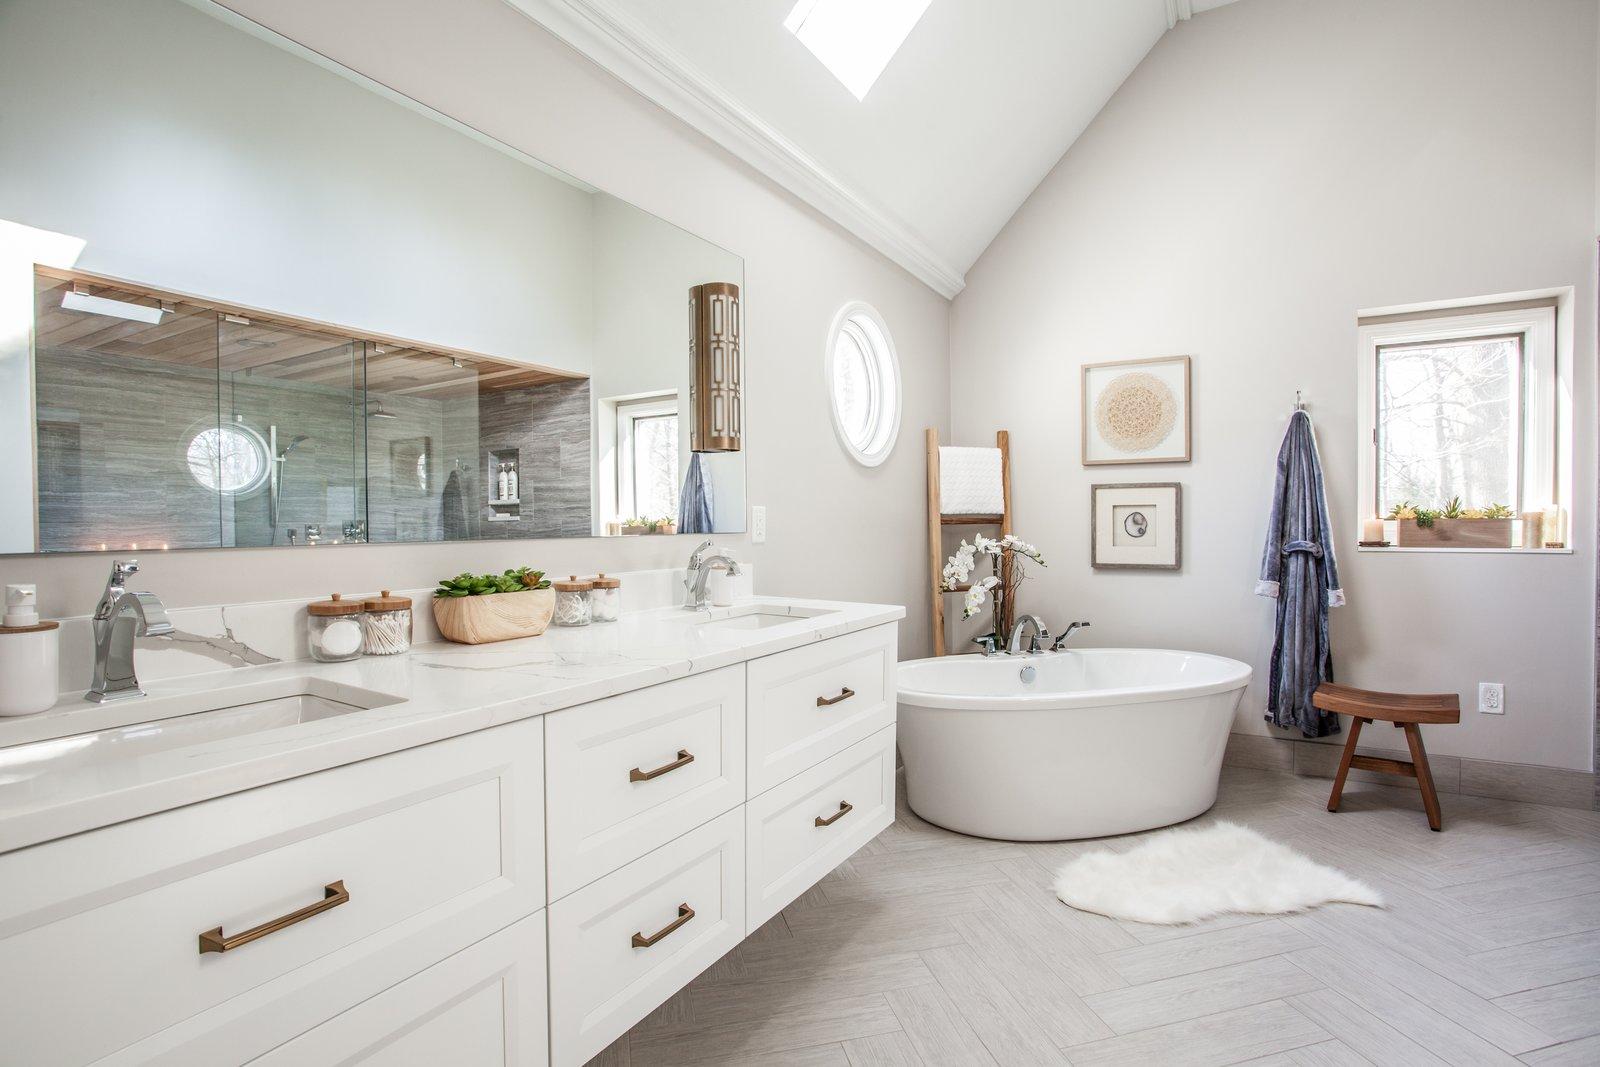 Bath Room, Open Shower, Freestanding Tub, and Full Shower  Ramsey Bathroom Remodel